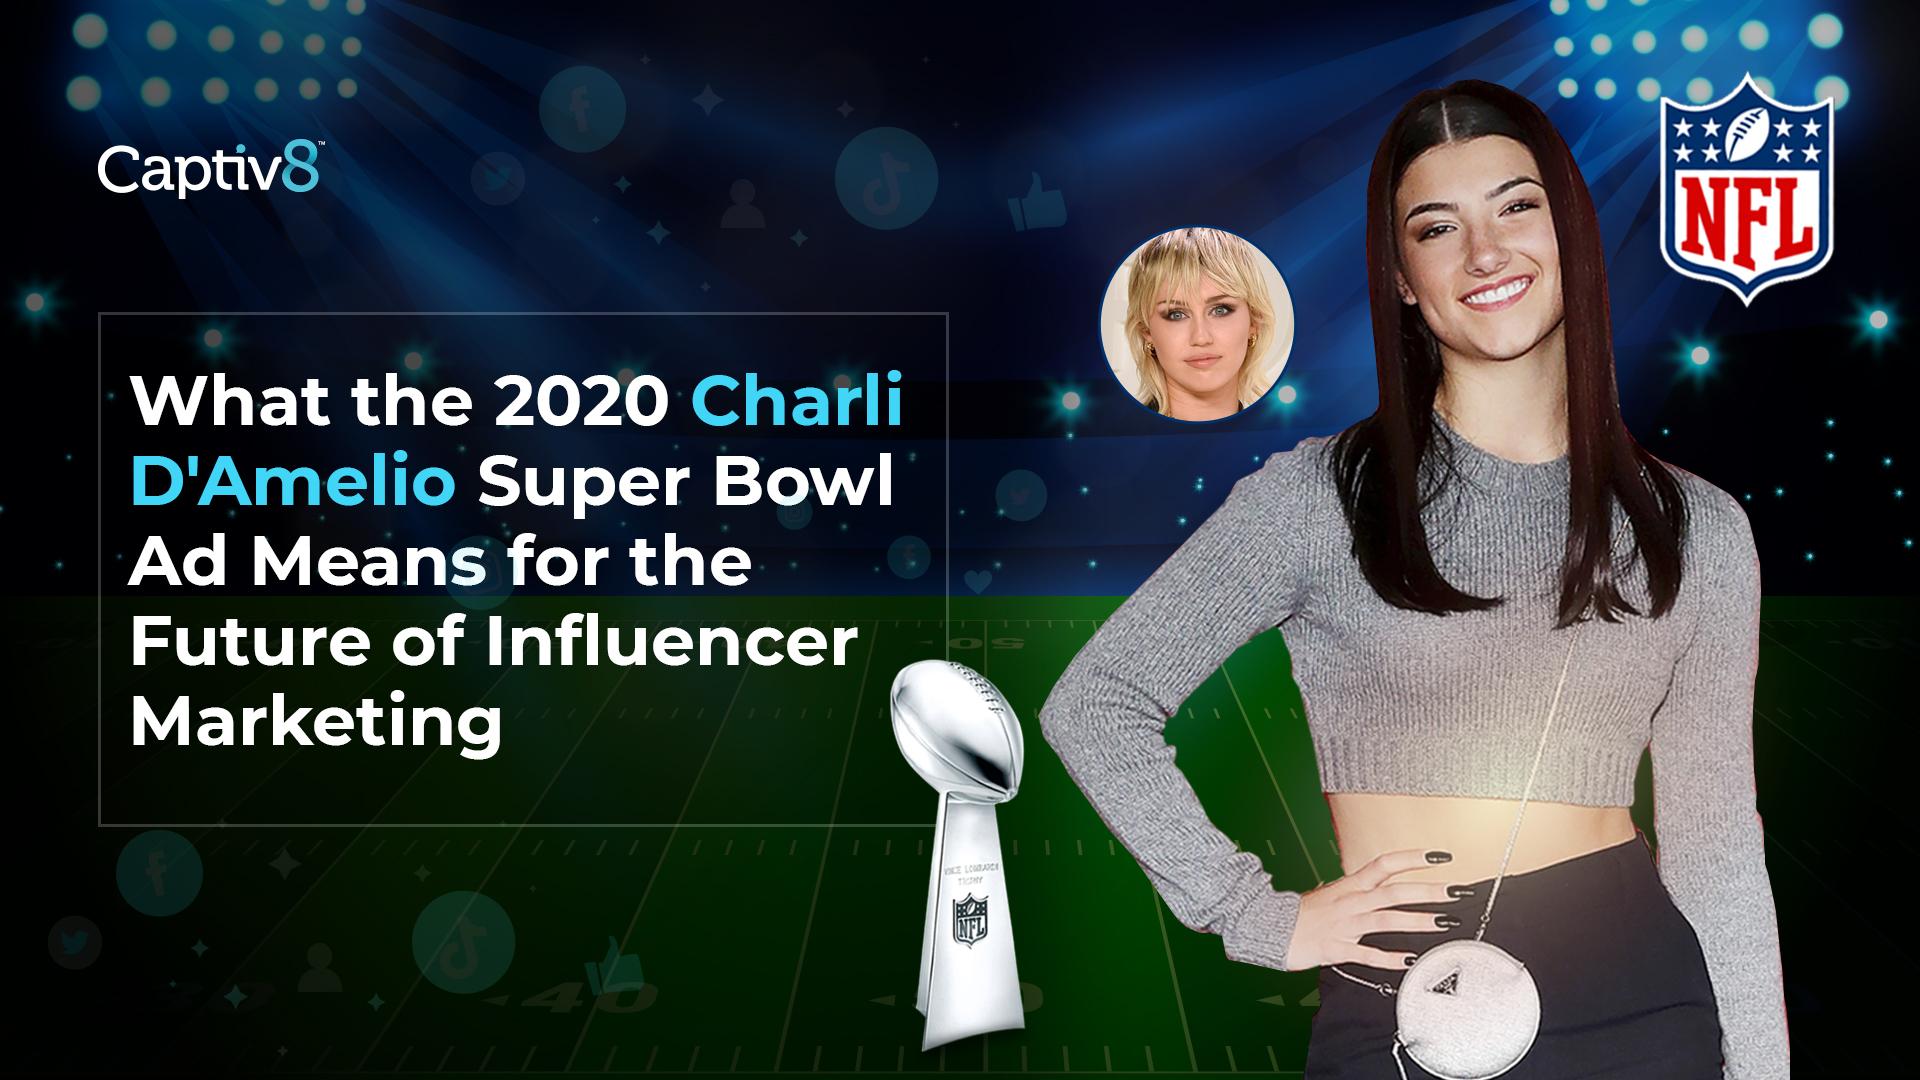 Charli D'Amelio Super Bowl